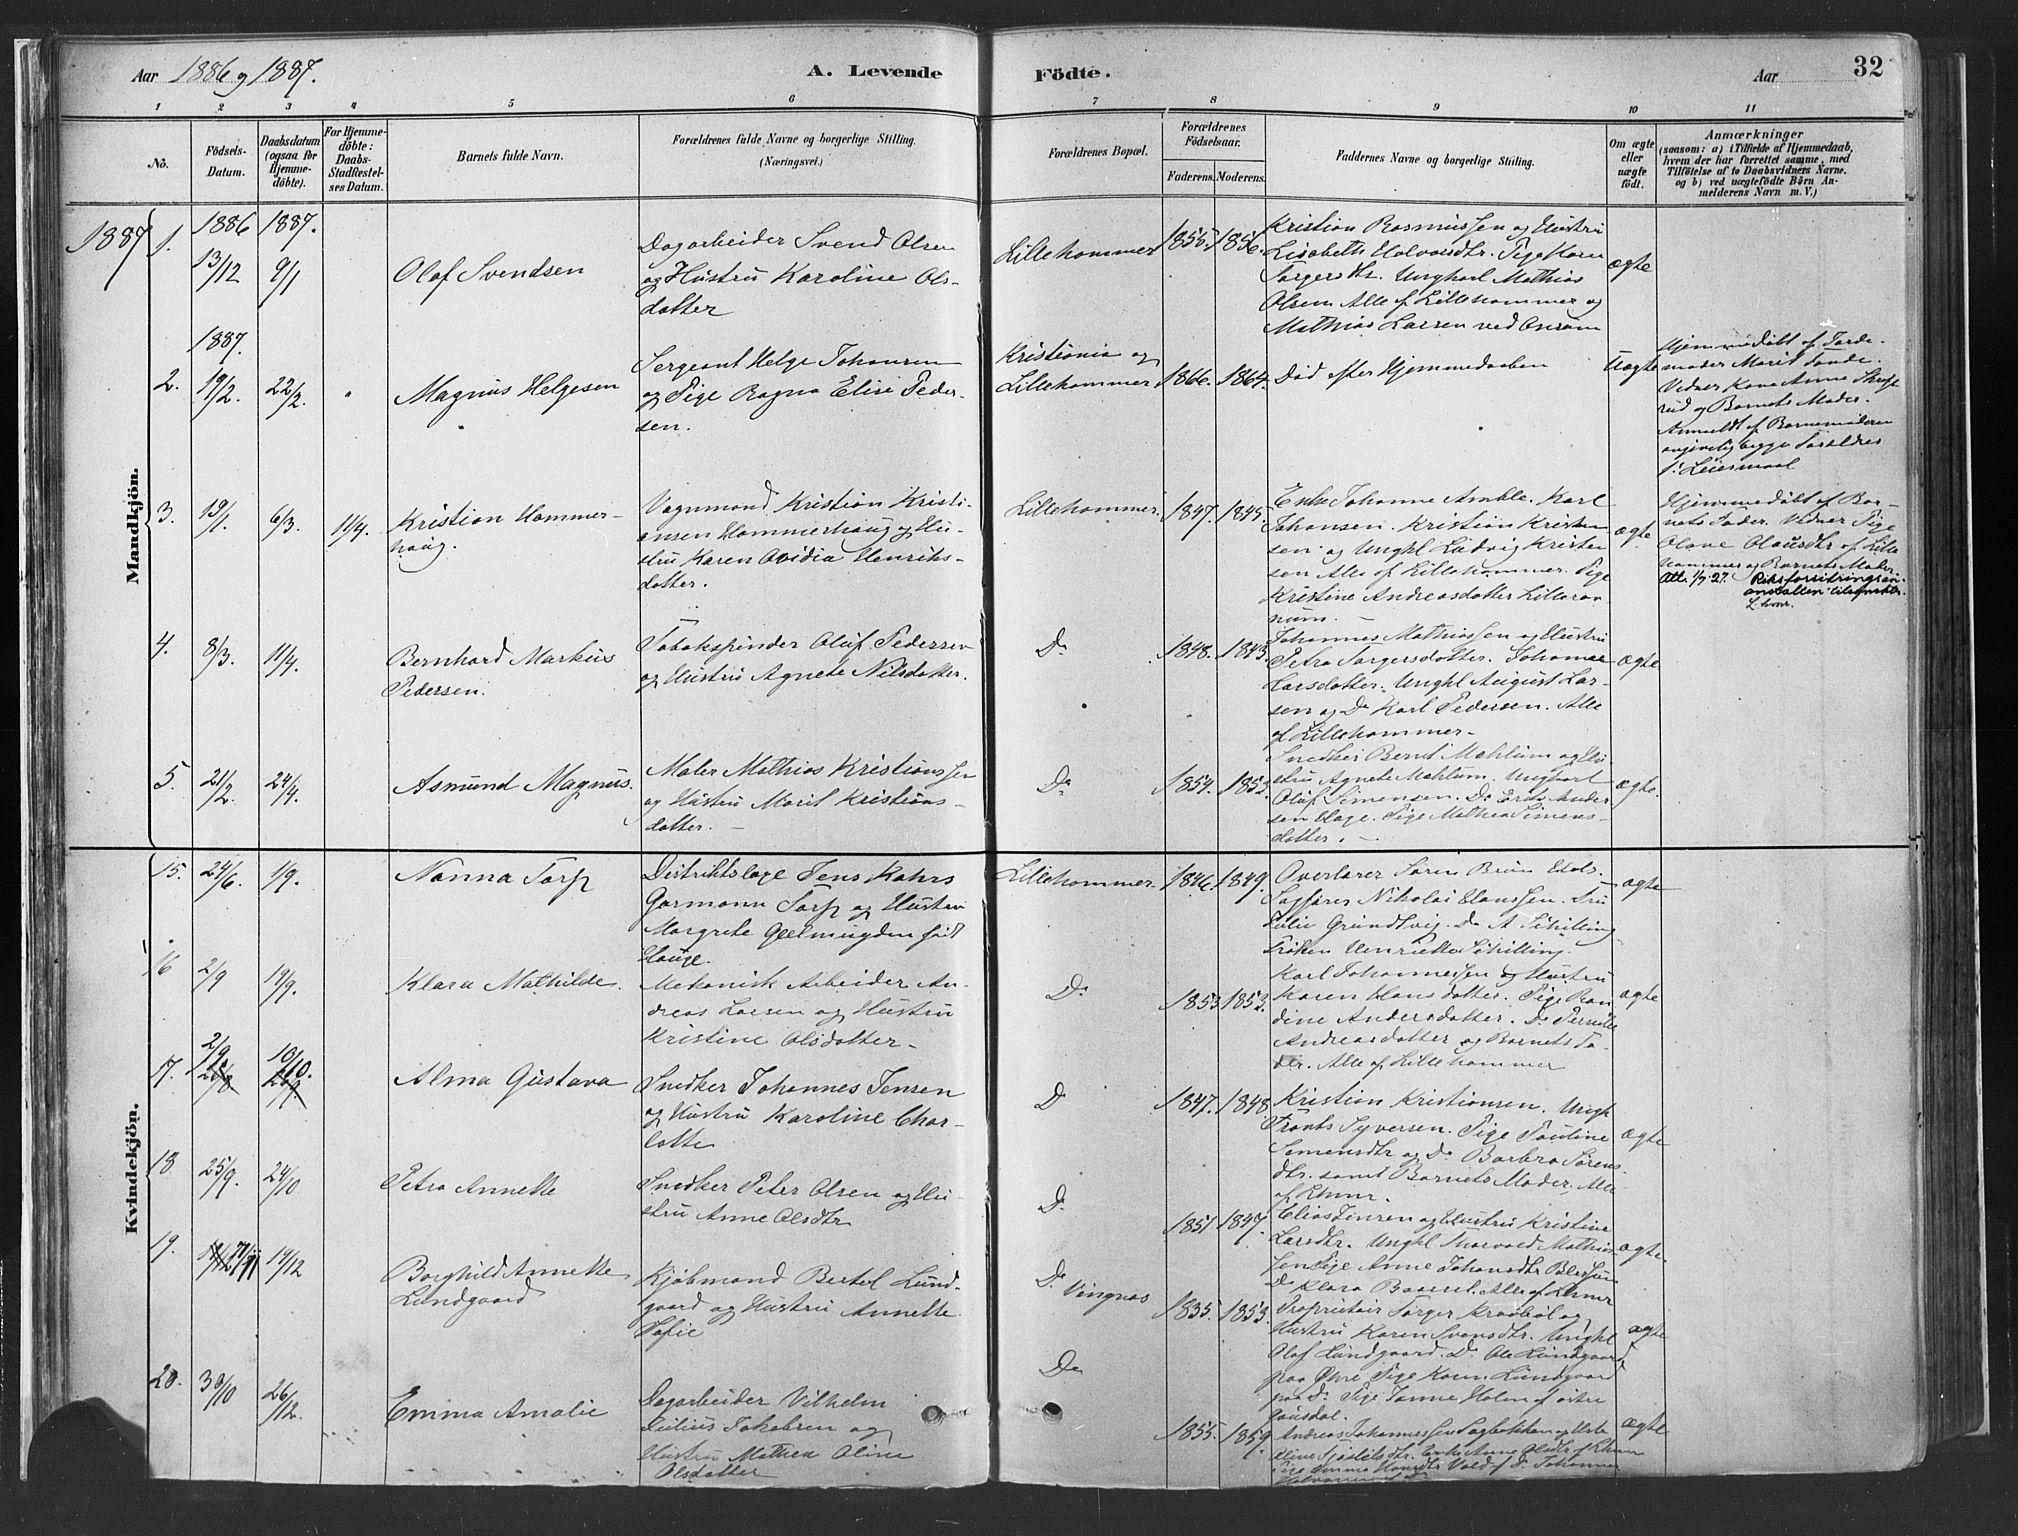 SAH, Fåberg prestekontor, H/Ha/Haa/L0010: Parish register (official) no. 10, 1879-1900, p. 32